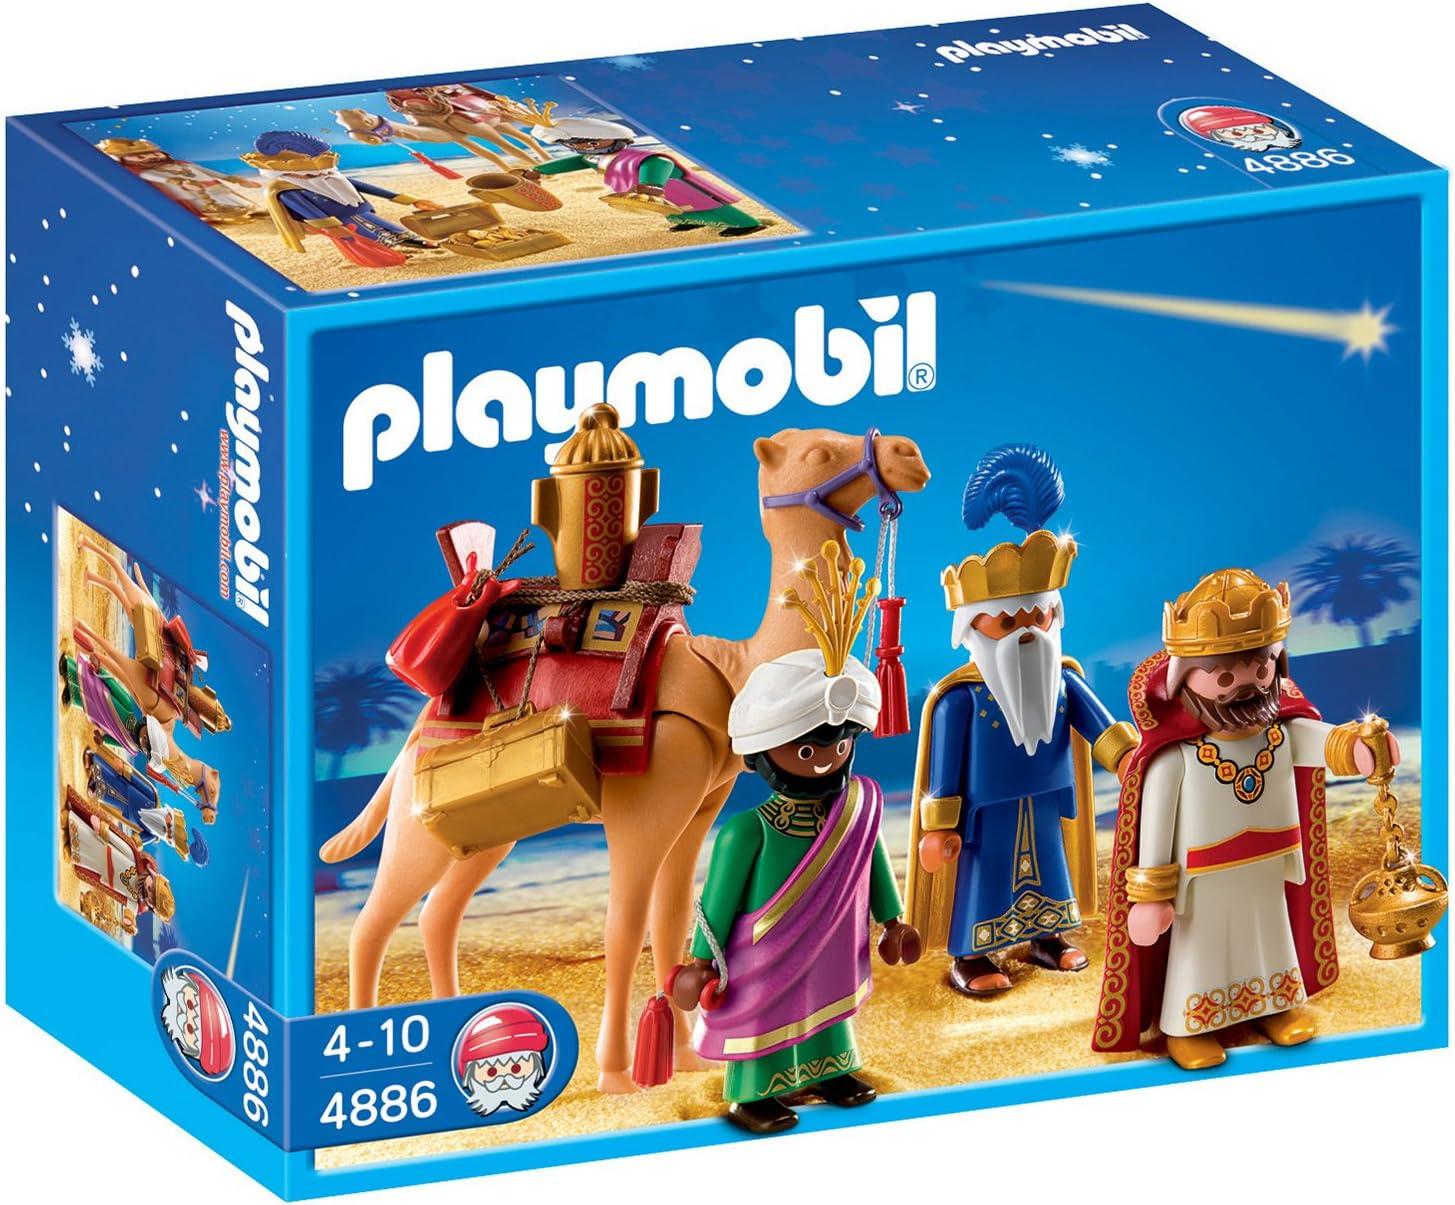 PLAYMOBIL - Reyes Magos, Figuras de Juguete (4886)